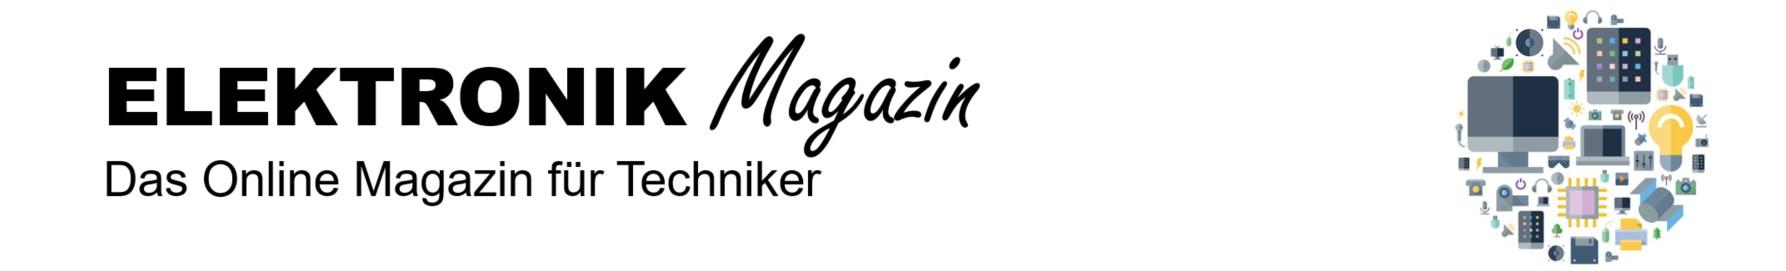 elektronik-magazin.com